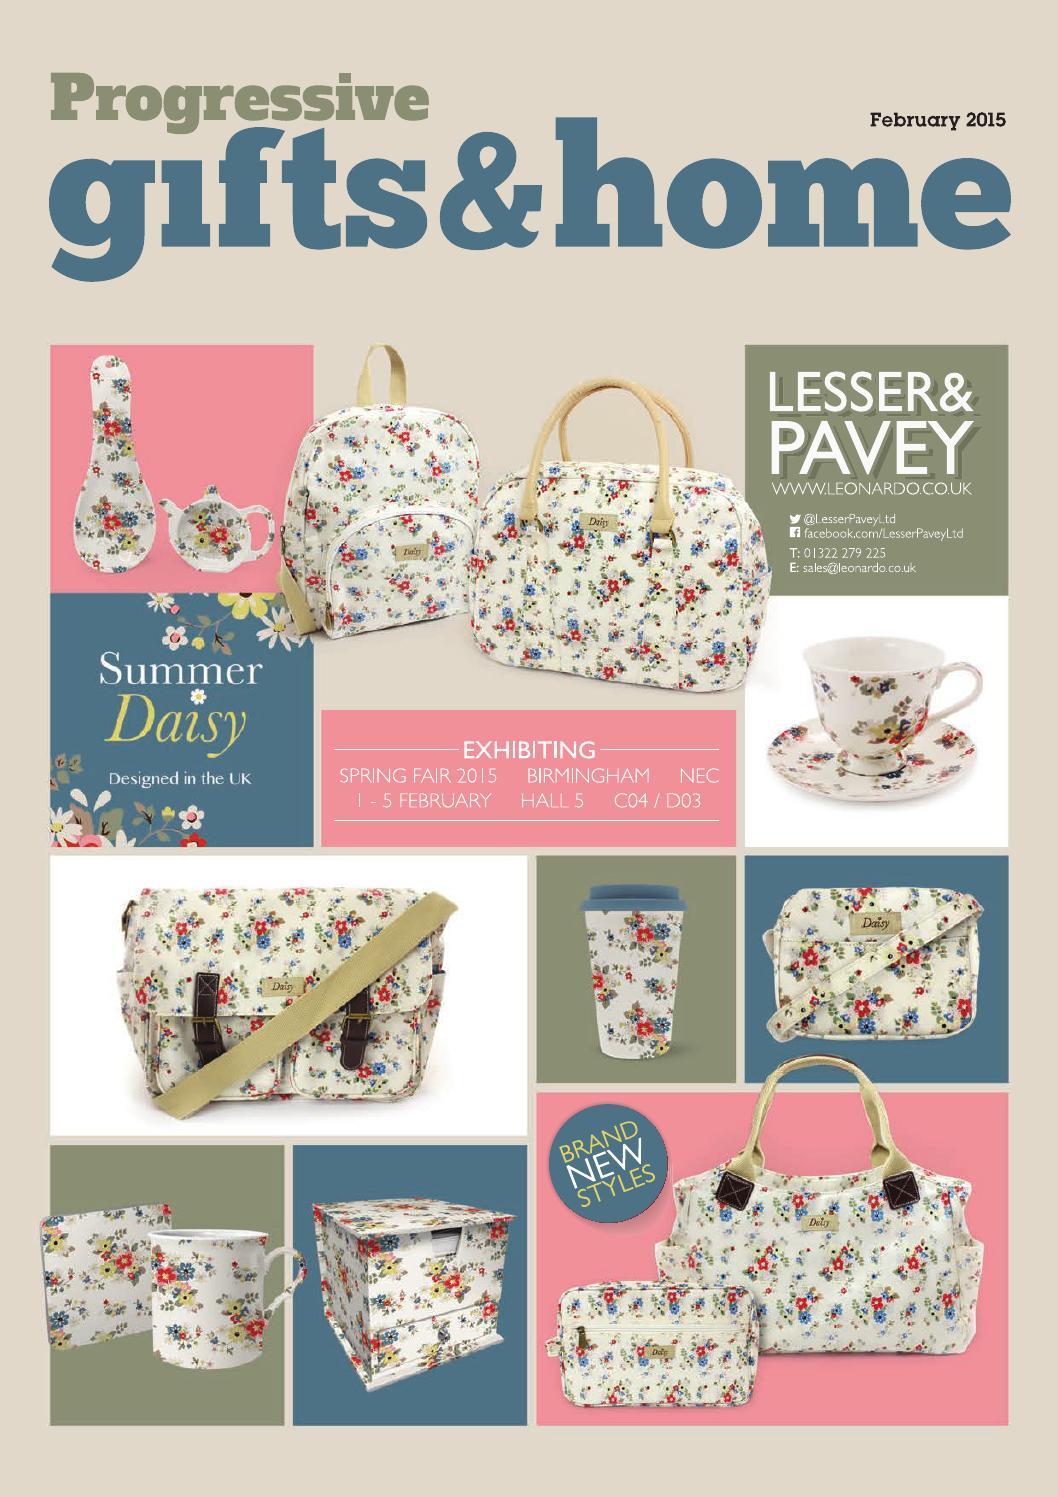 da35f554e3ef14 Progressive Gifts and Home February 2015 by Max Publishing - issuu